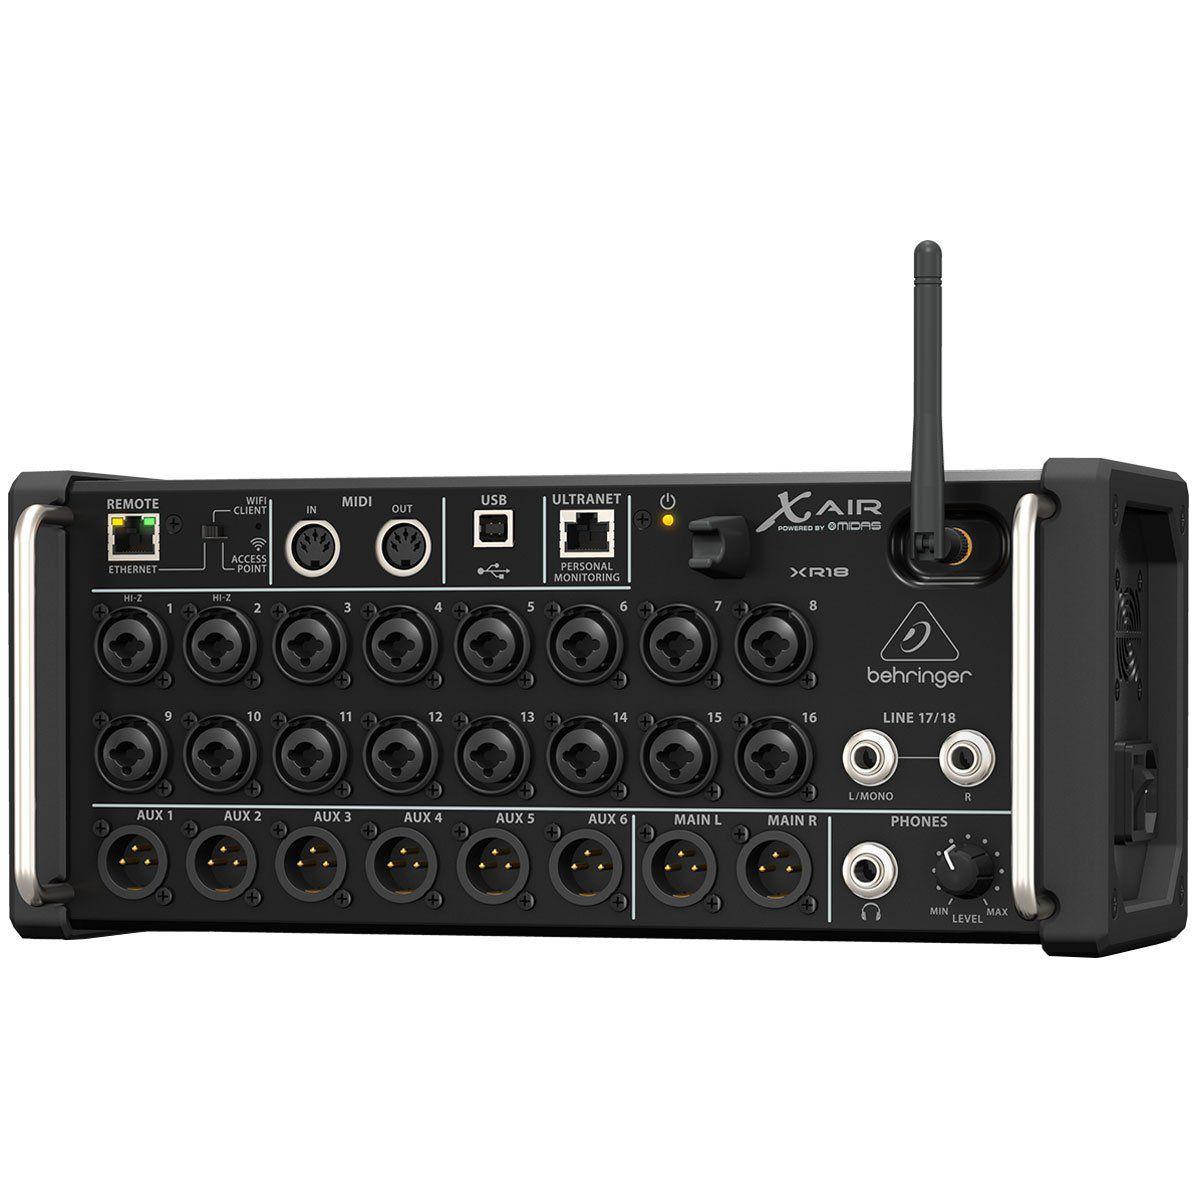 Mixer Digital X-air XR18 - Behringer